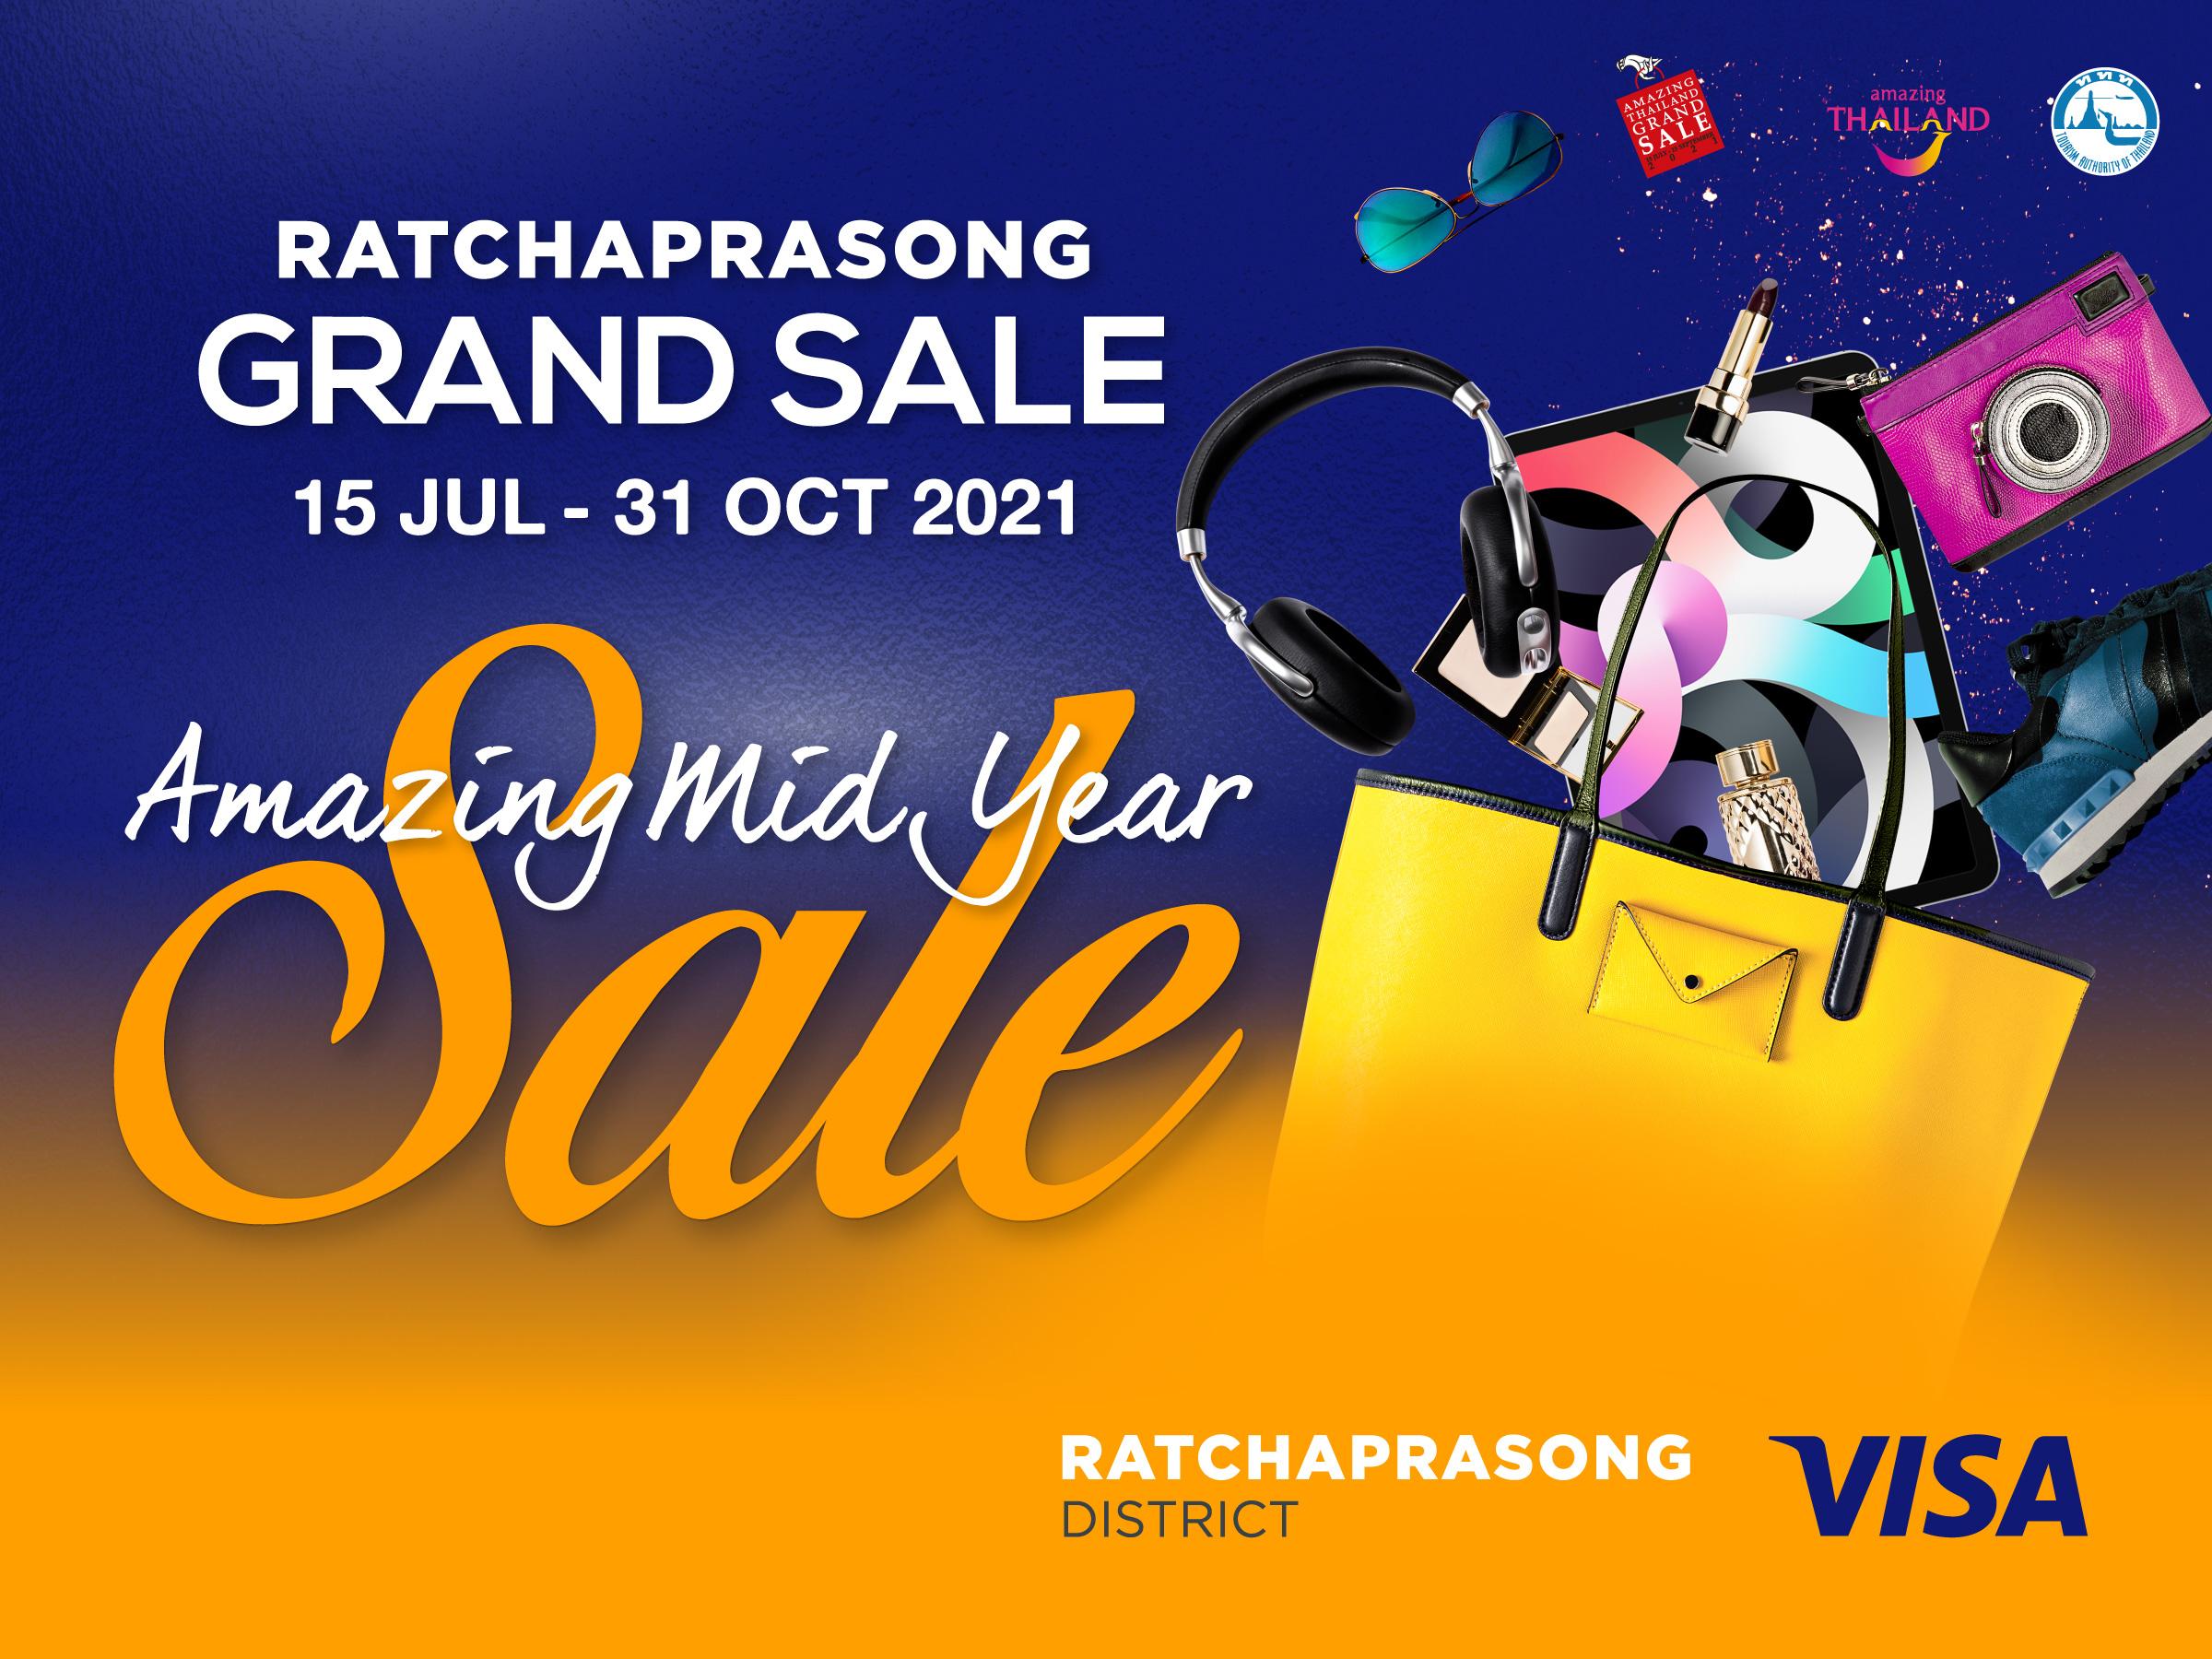 Ratchaprasong Grand Sale 2021 Amazing Mid Year Sale